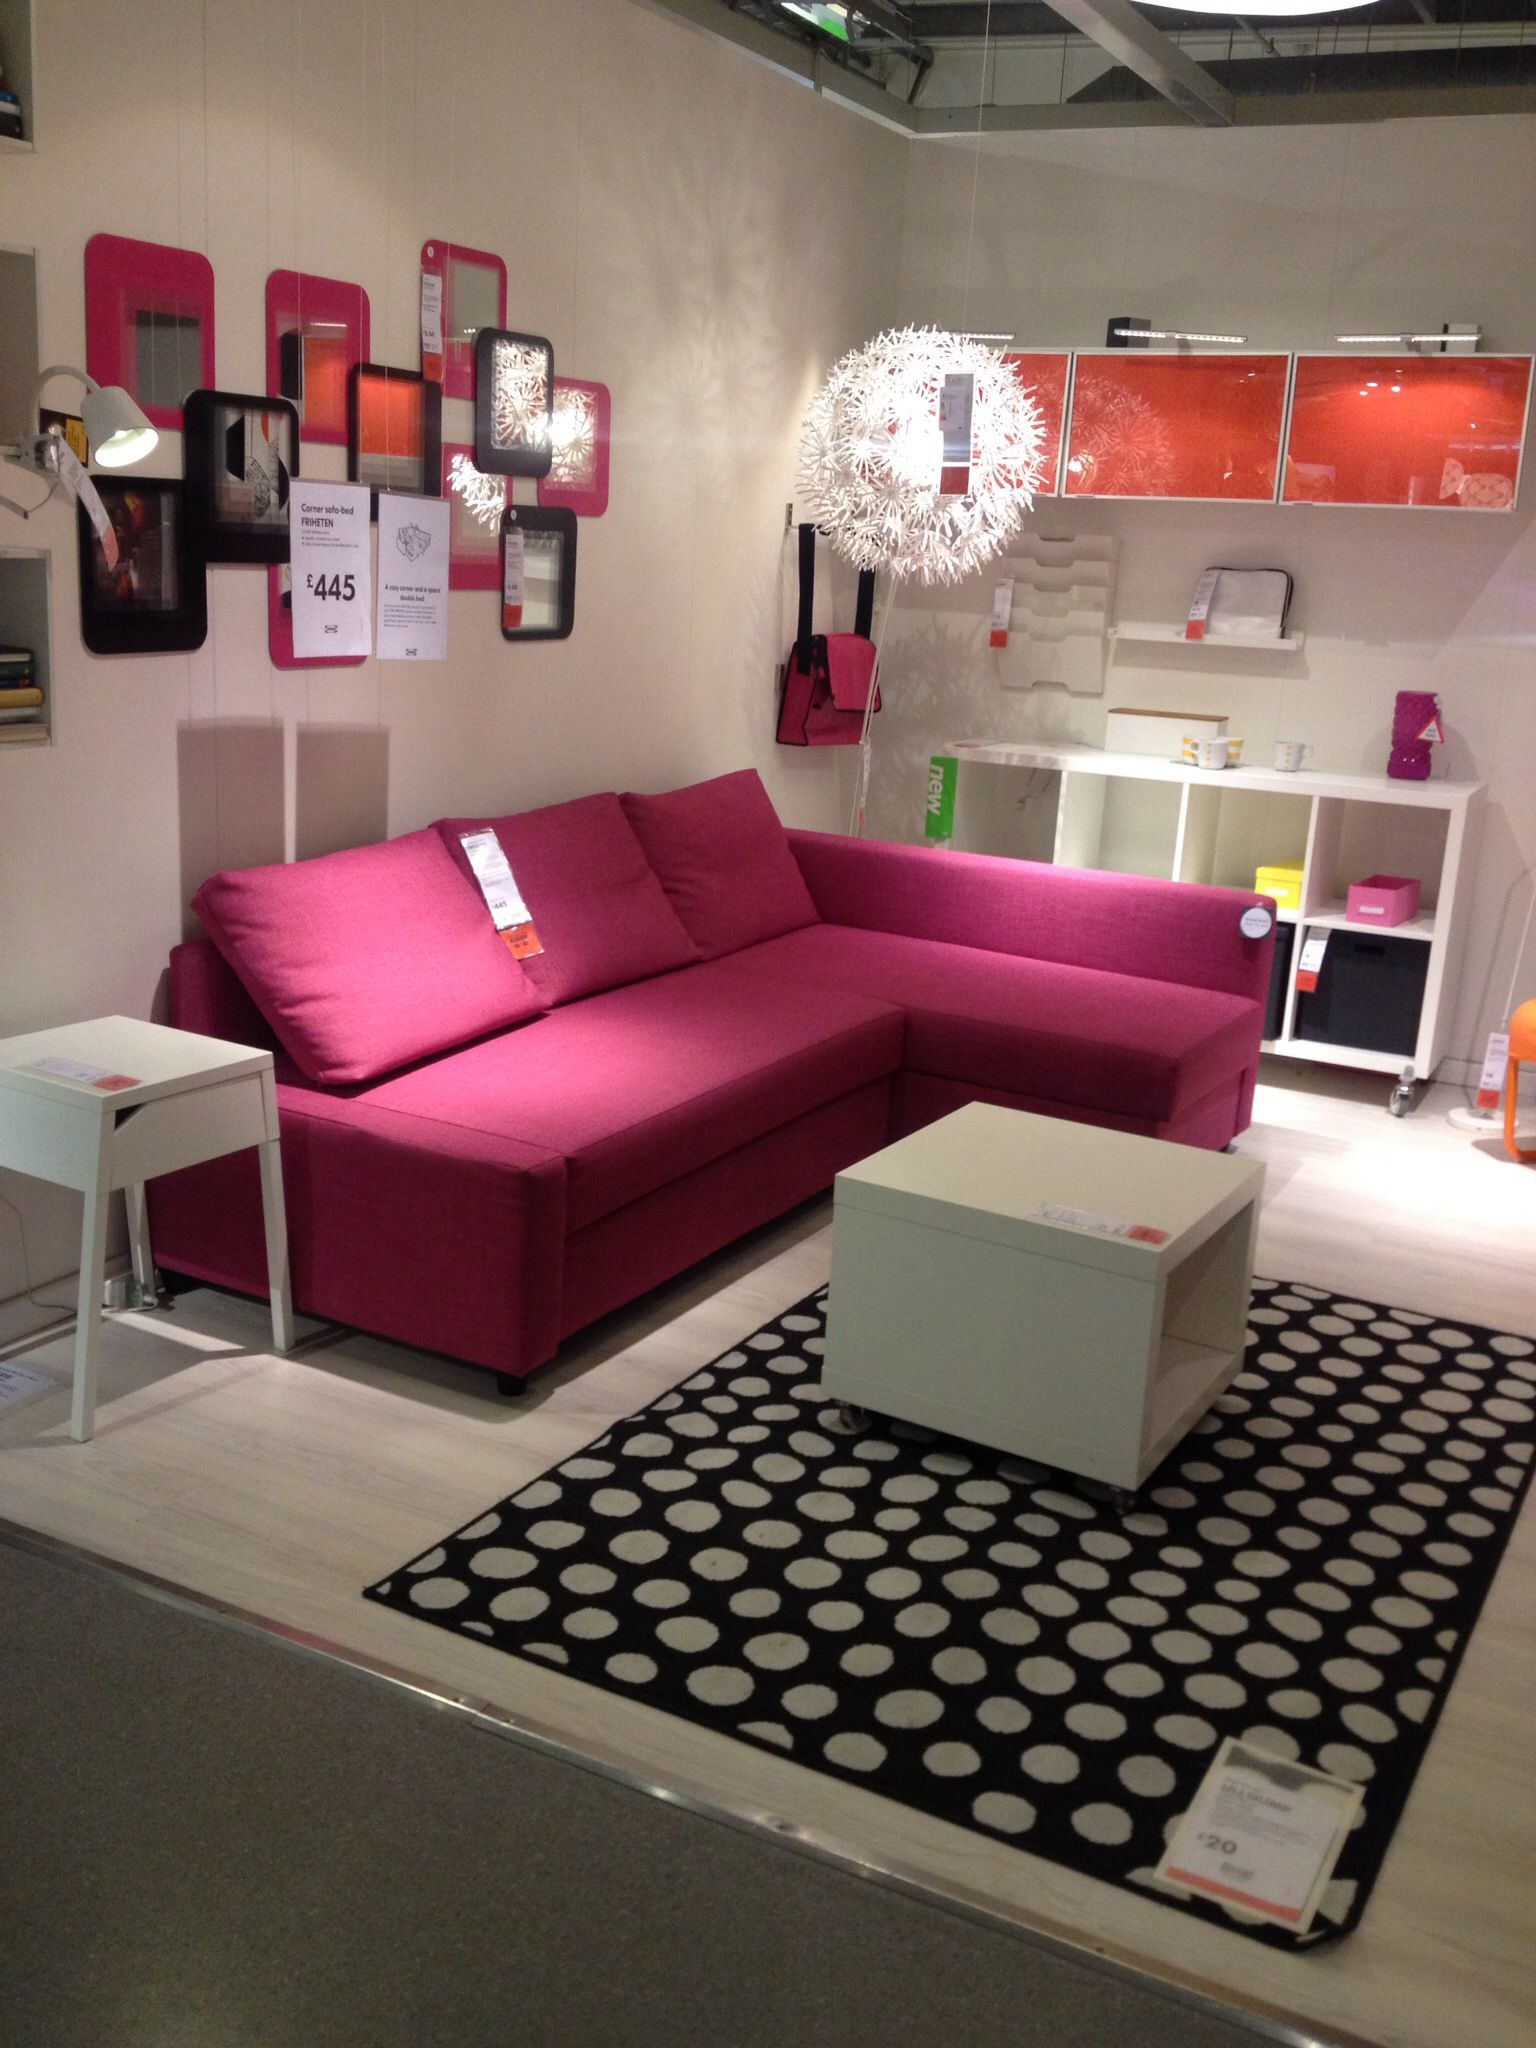 Sleeper Sofas For Small Areas Spinmaster Marshmallow Flip Open Sofa Disney Frozen Bed Friheten The Home Settee